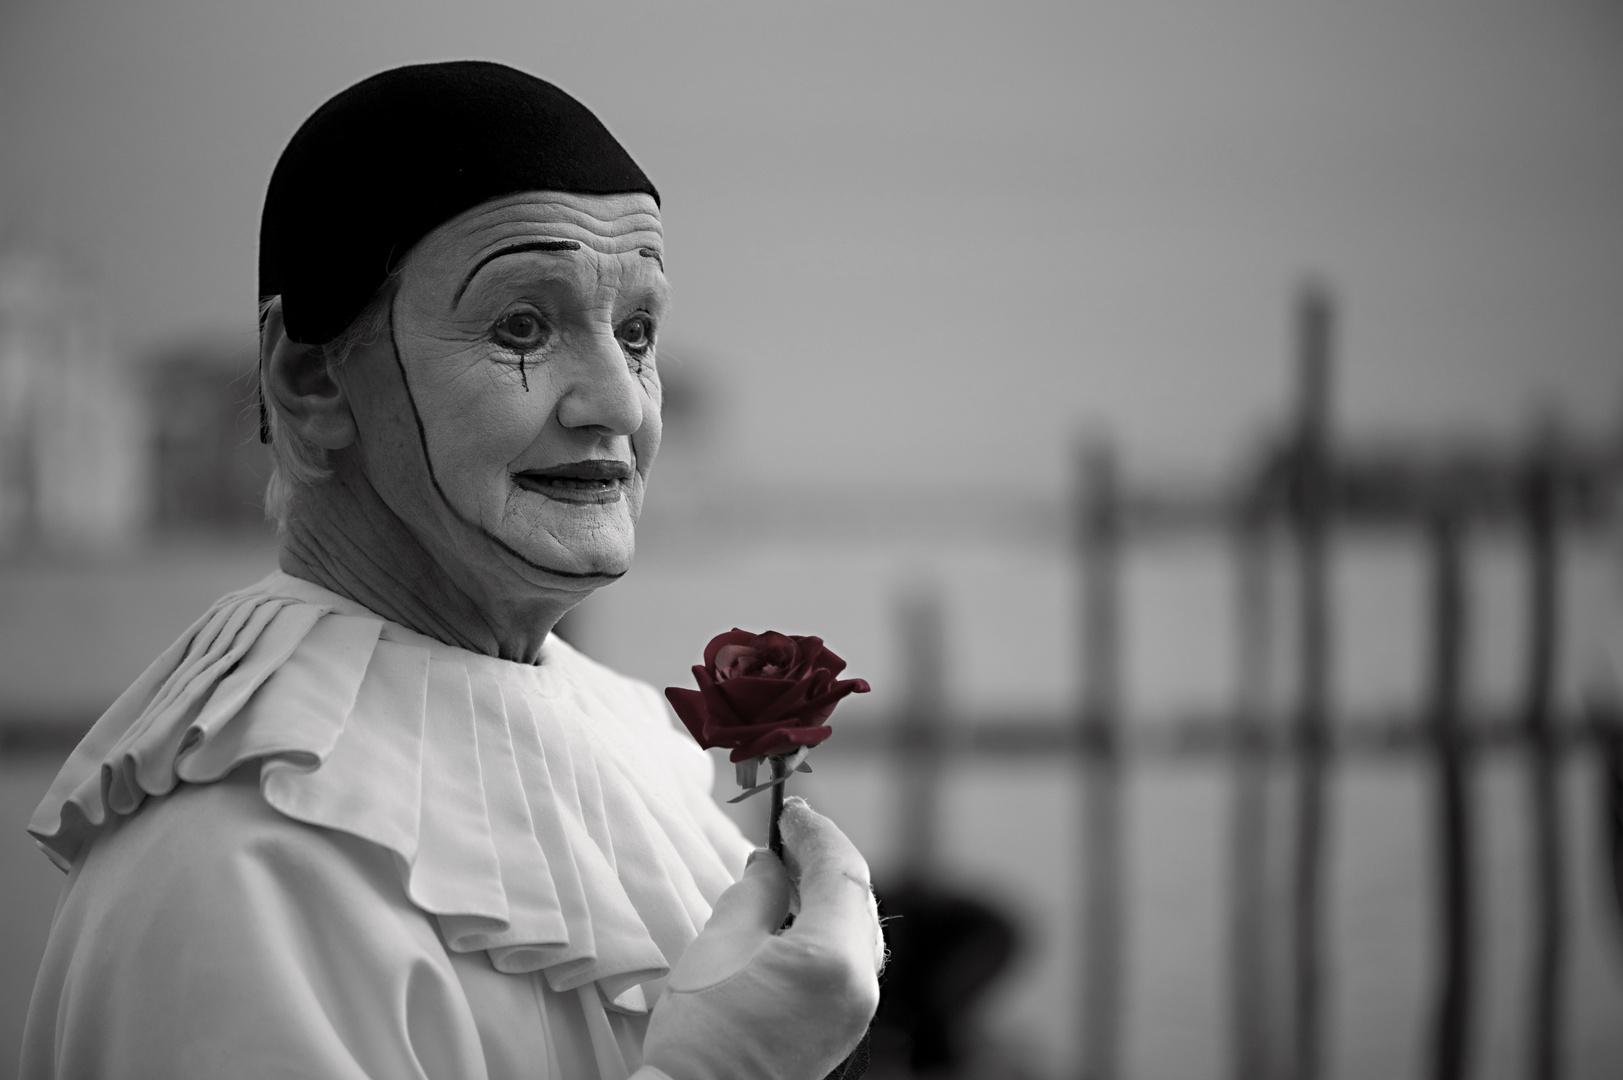 __rose of venice__